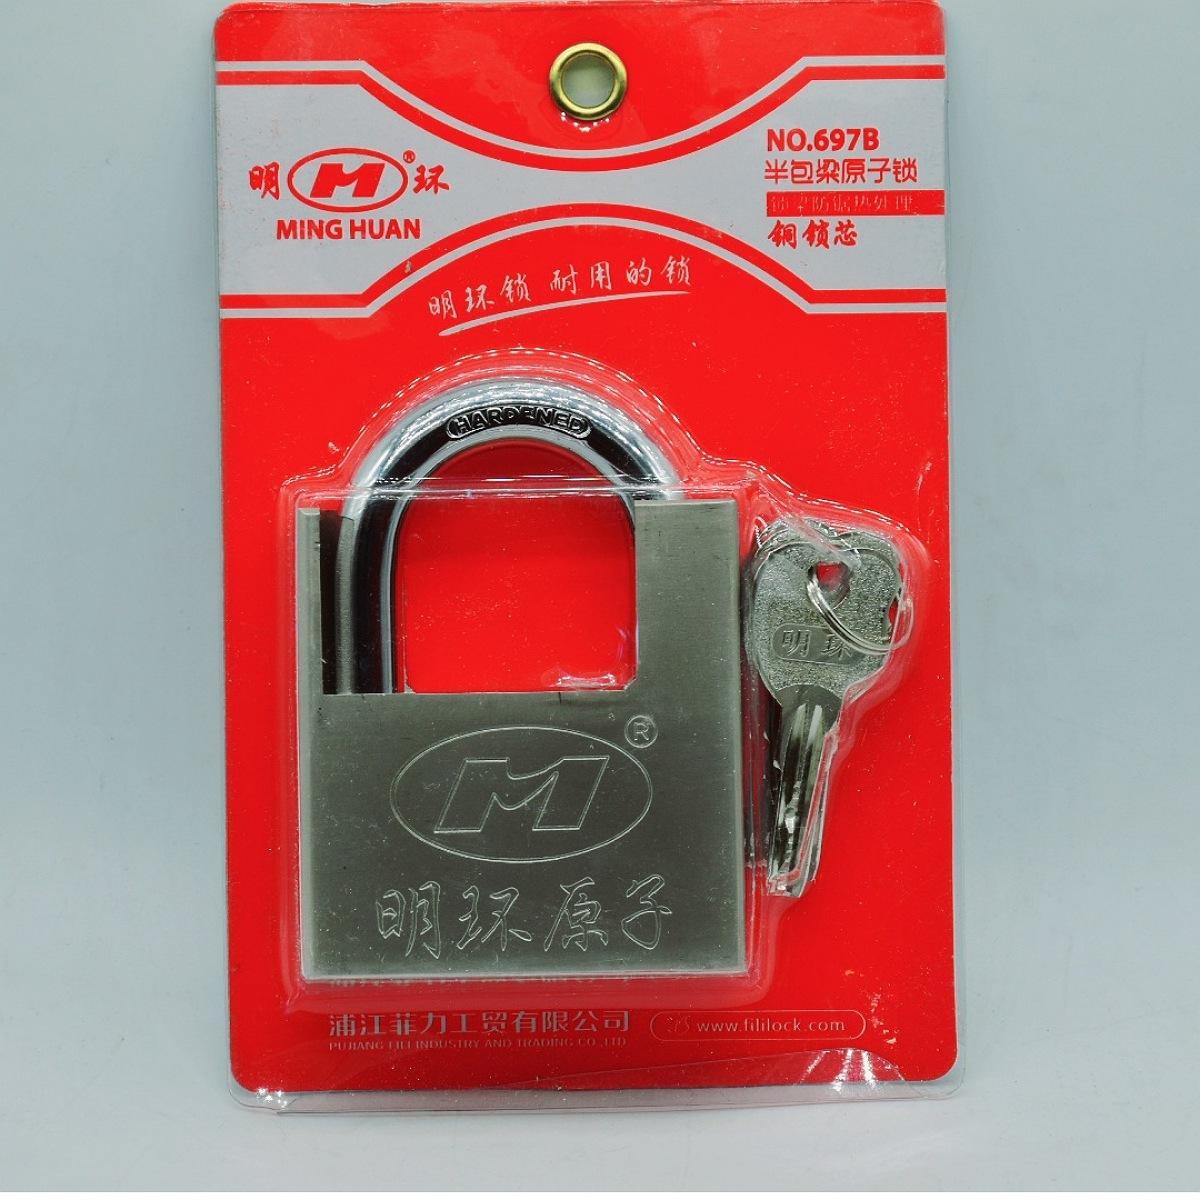 قفل آویز مینگ هوان مدل 697B